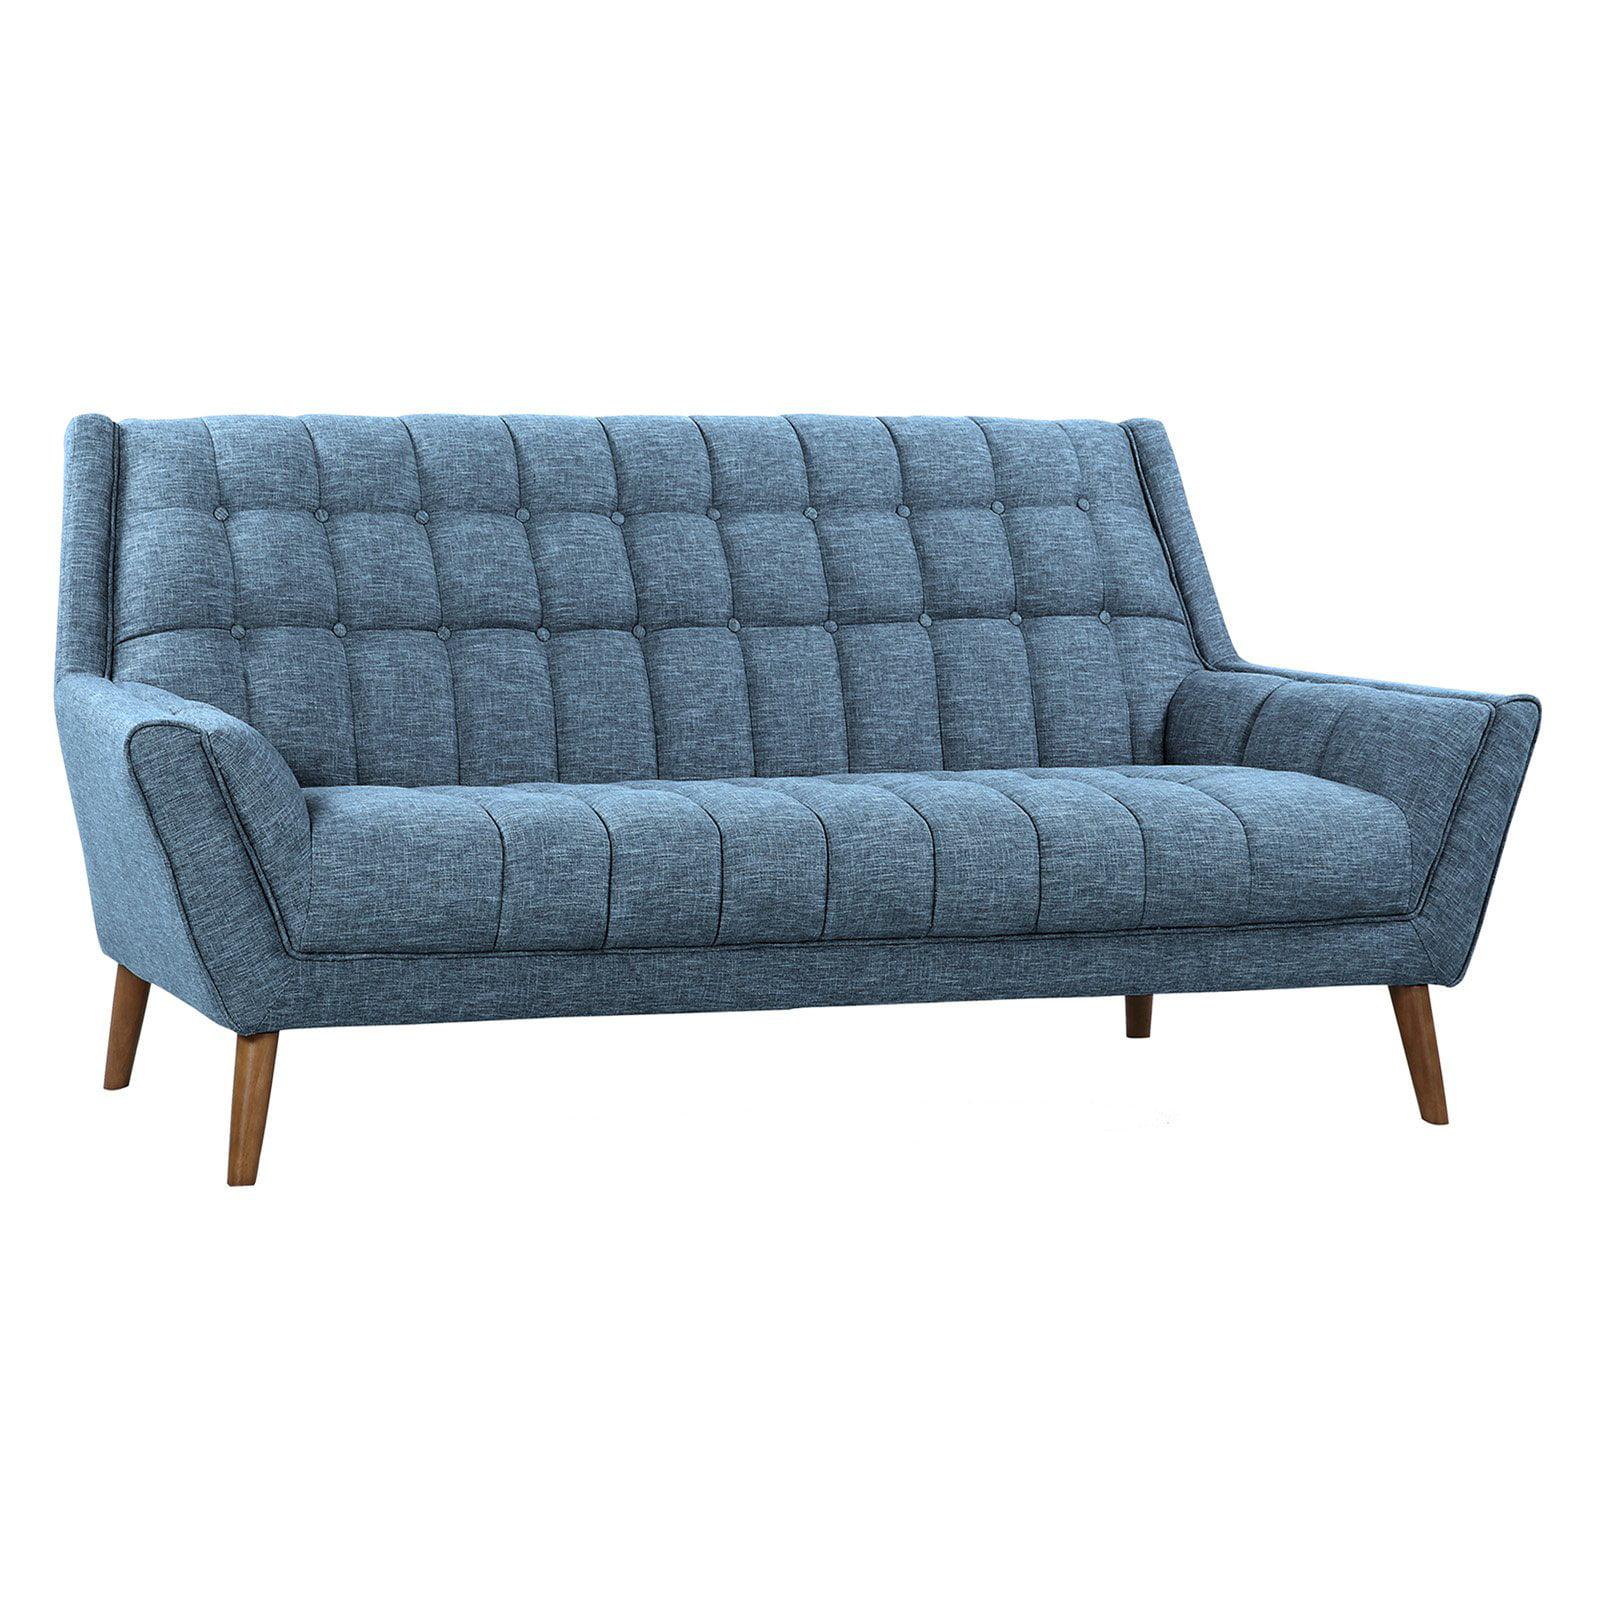 Armen Living Cobra Mid-Century Modern Sofa with Linen and Walnut Legs